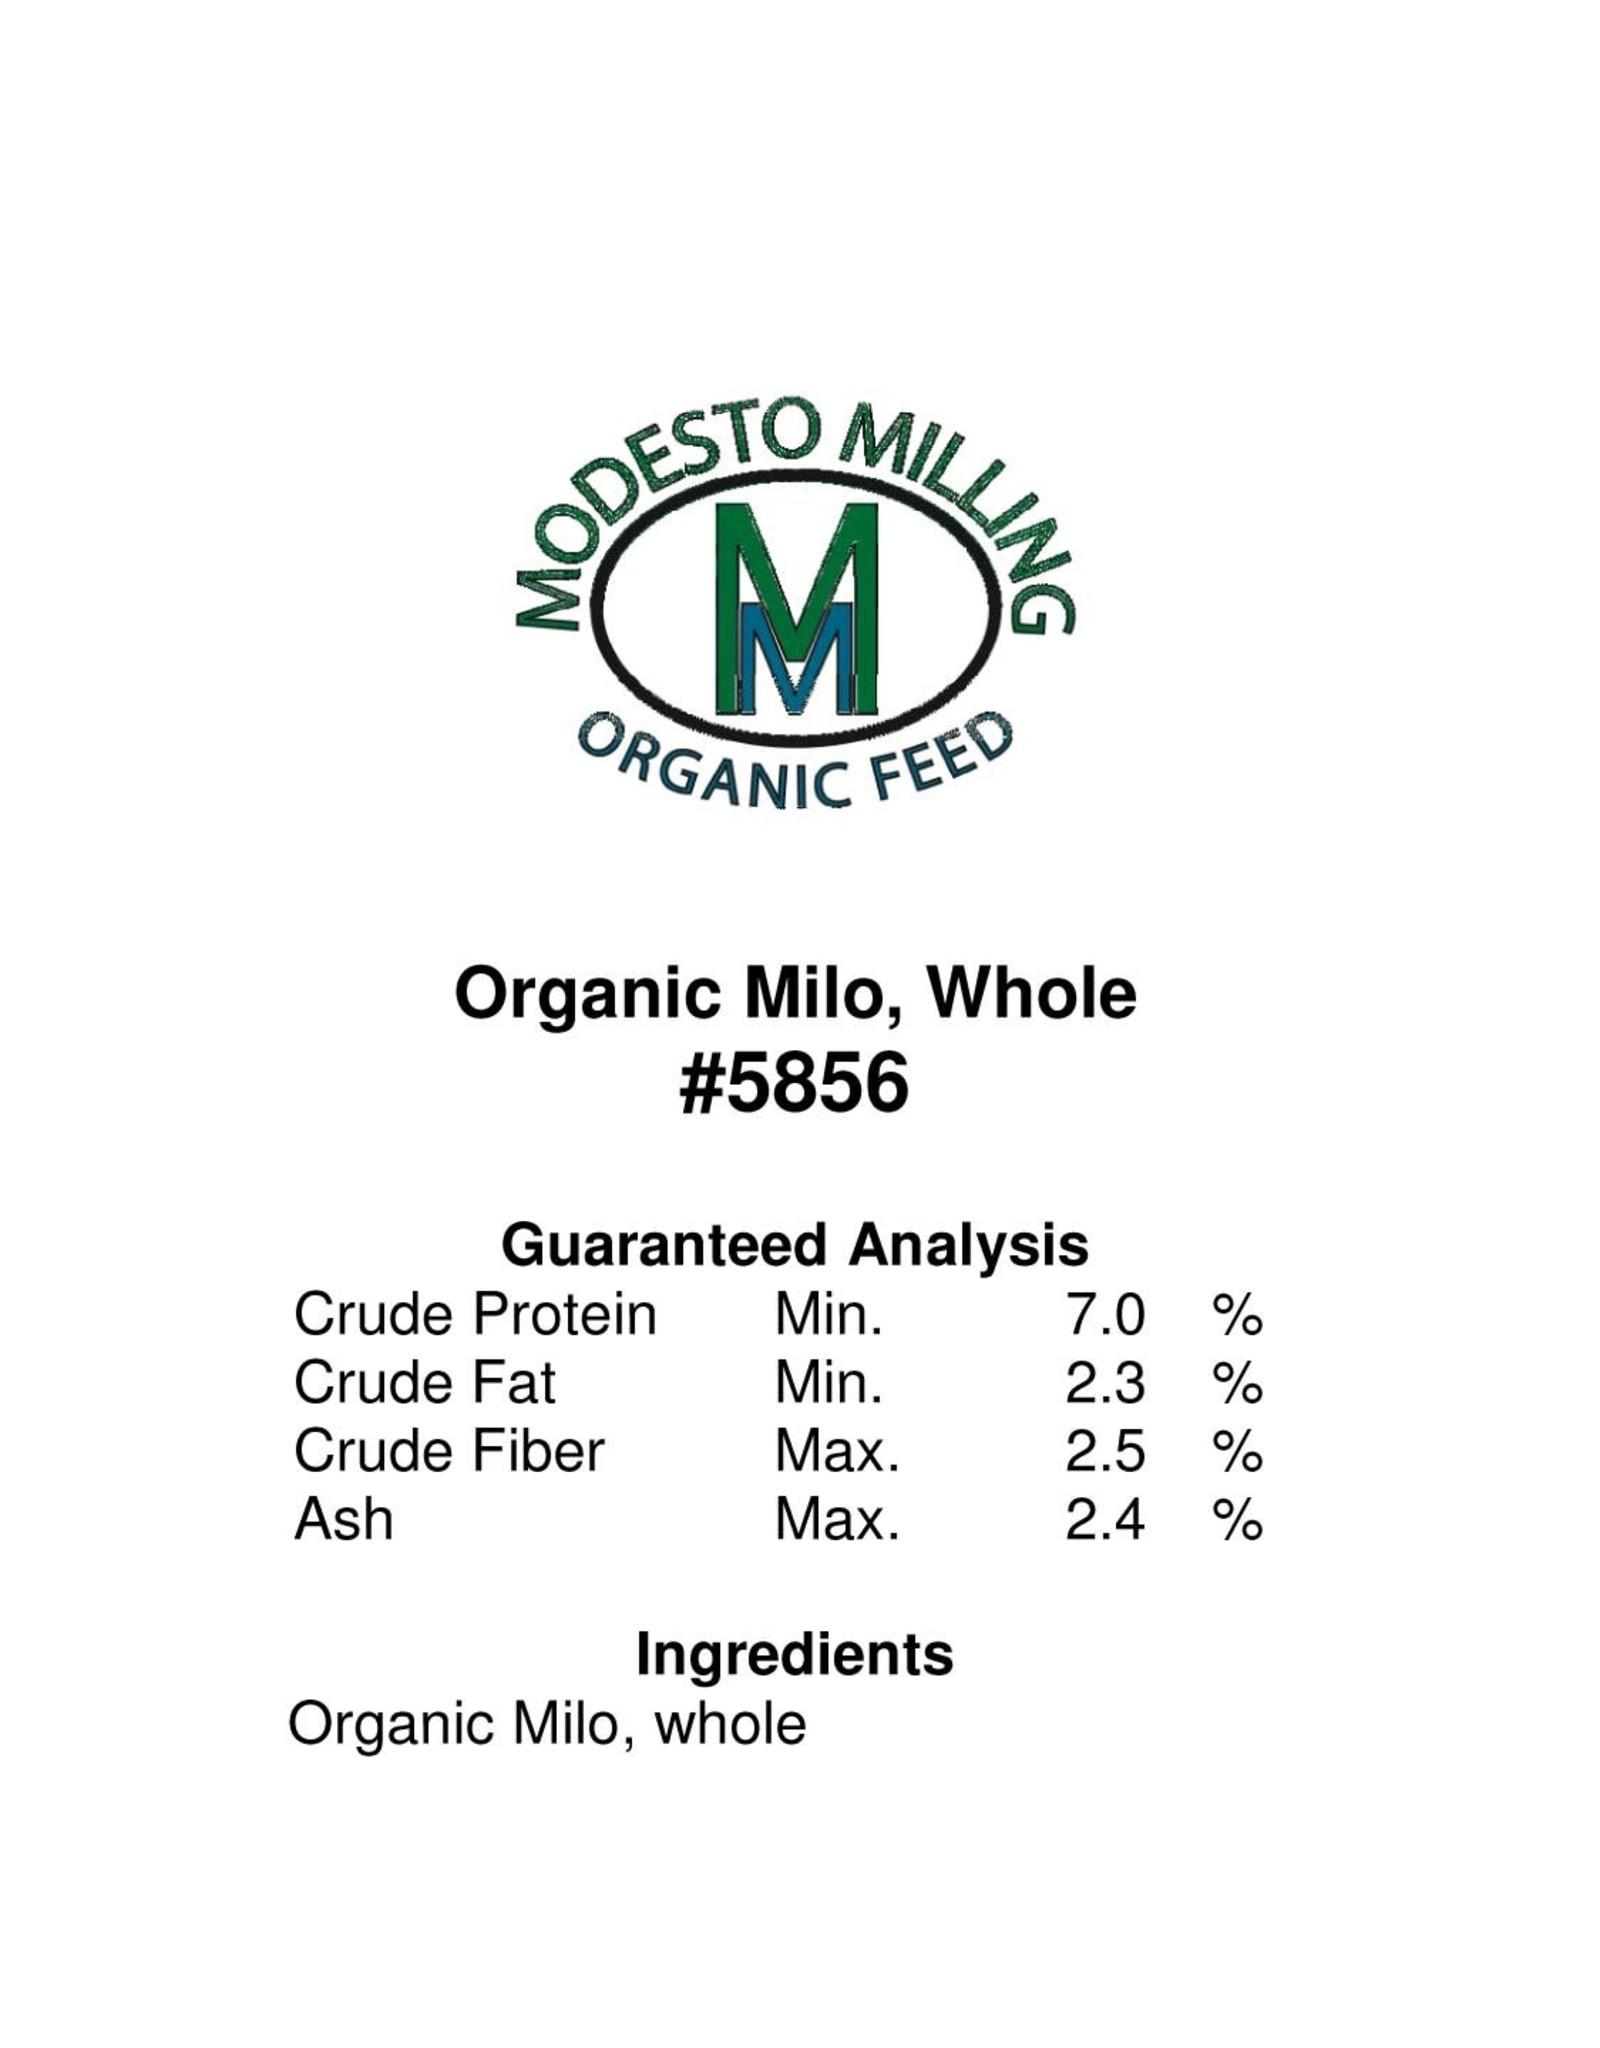 Modesto Milling Whole Milo